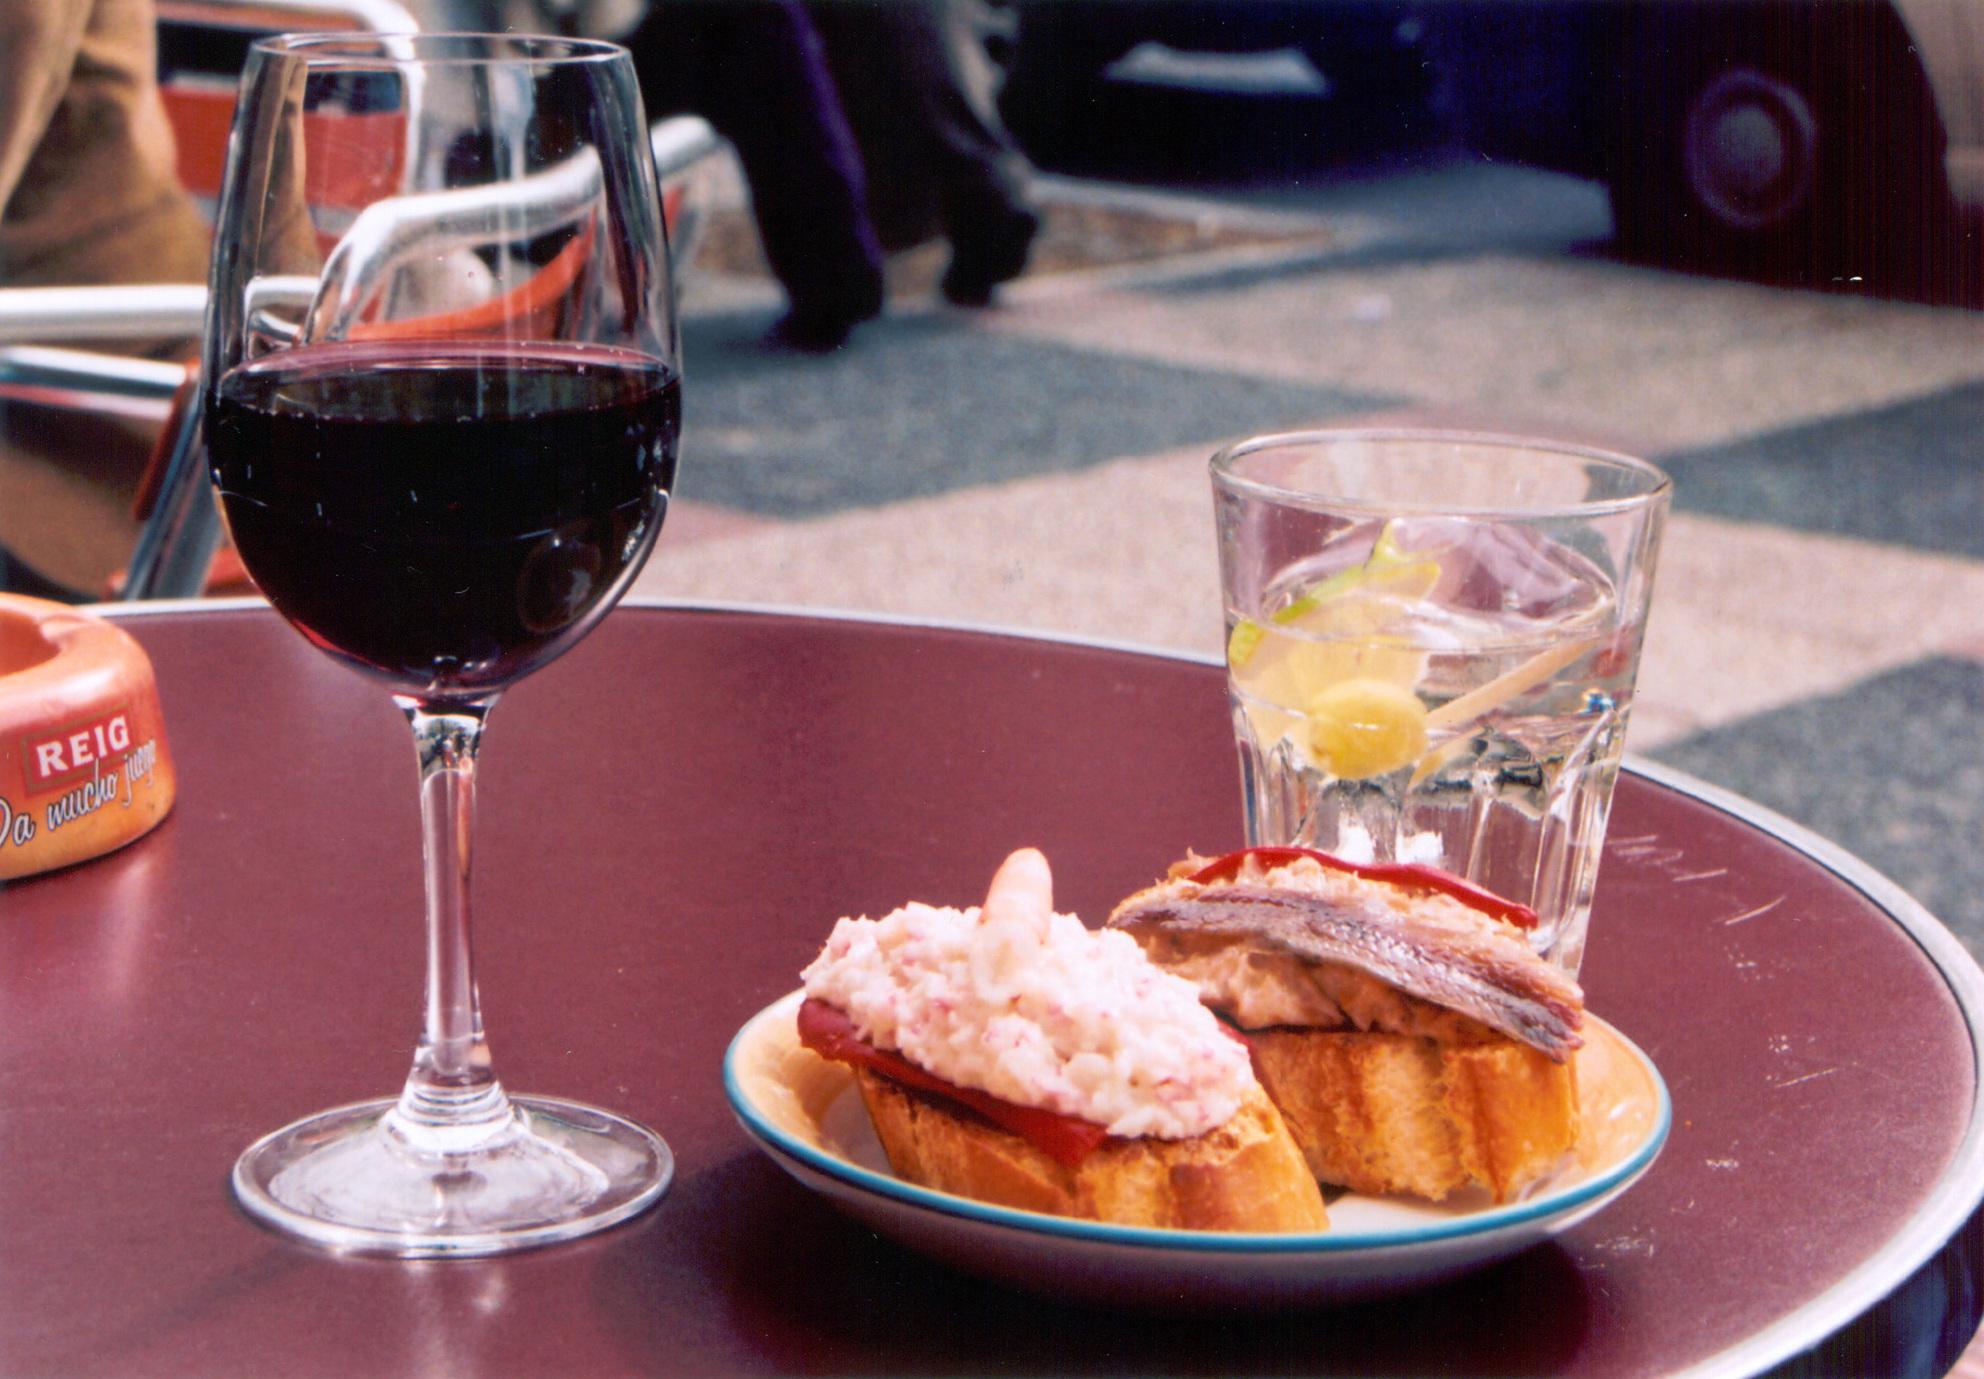 File:Pinchos aperitivo.jpg - Wikimedia Commons